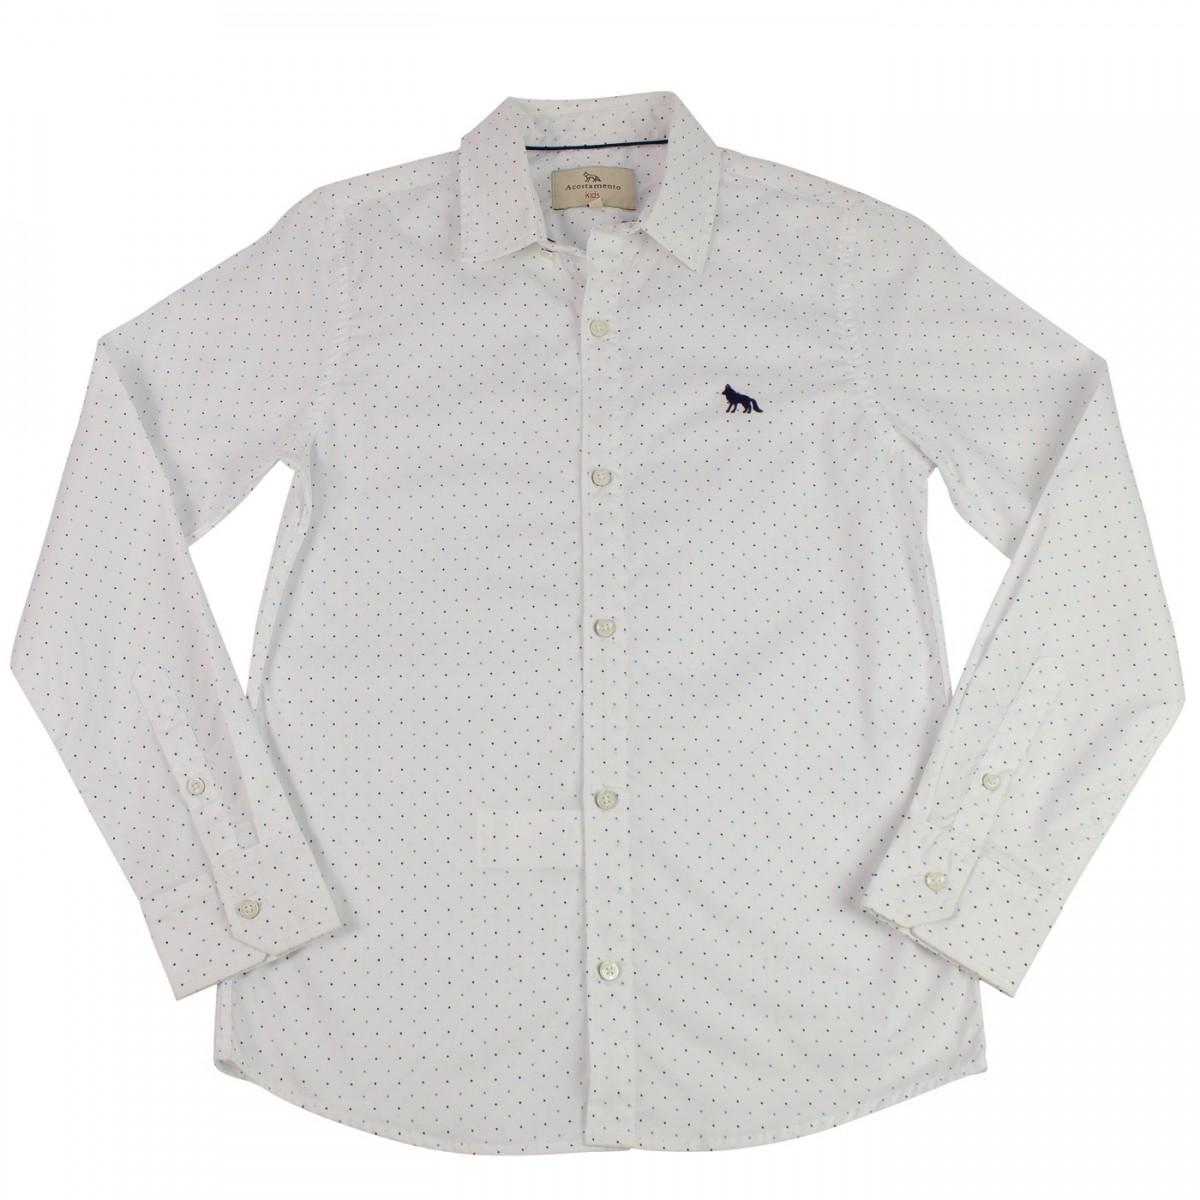 Bizz Store - Camisa Social Infantil Masculina Acostamento Branca e5261000c2bd7